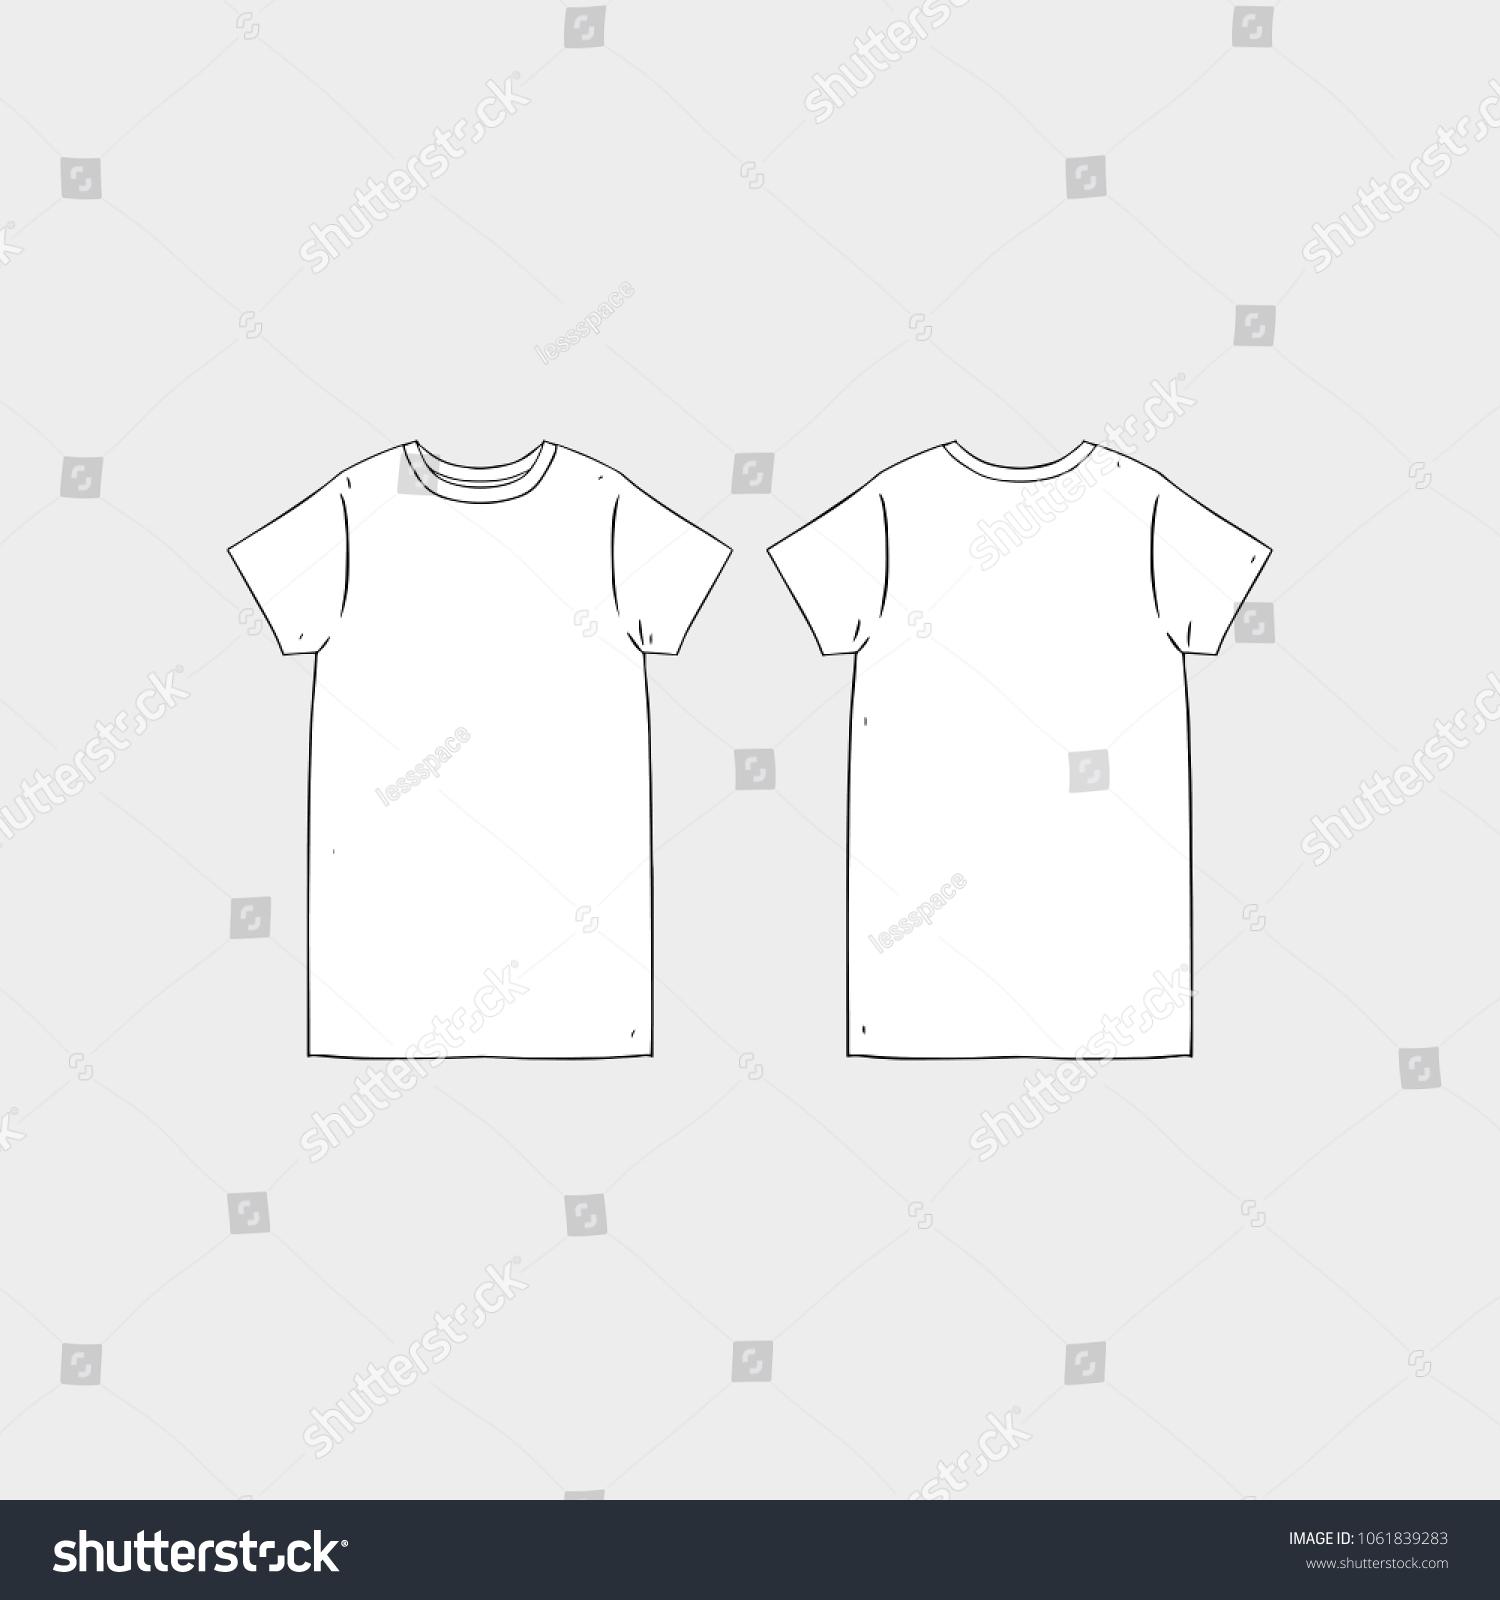 image relating to Printable T Shirt Templates identified as Blank Tshirt Template Printable